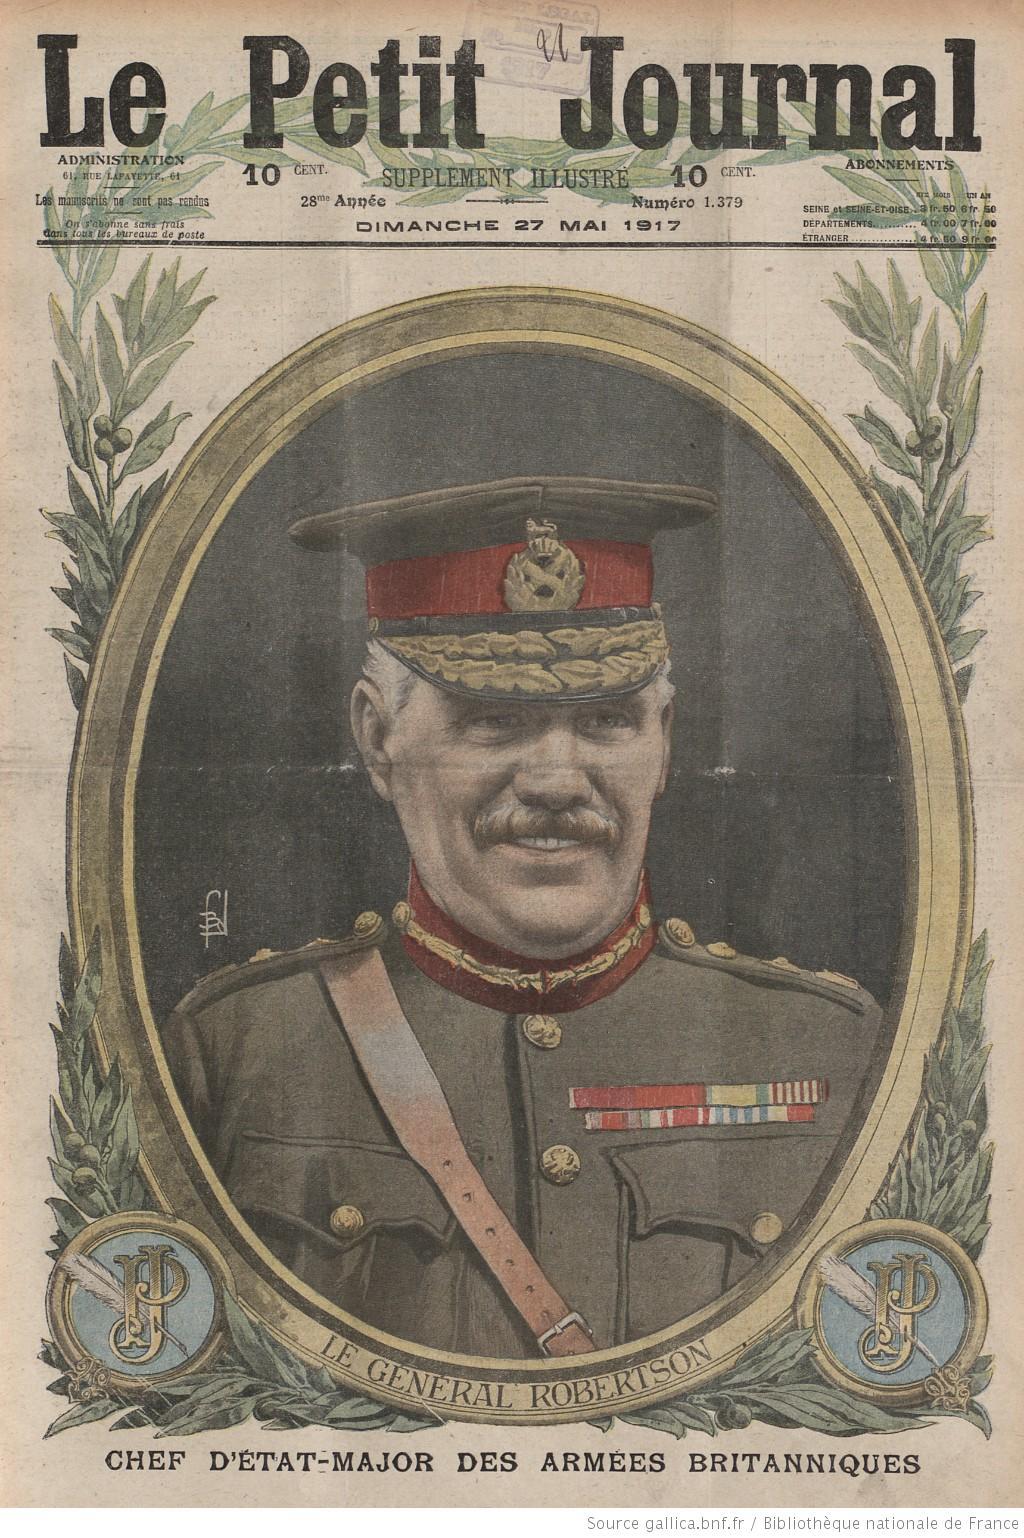 LPJ Illustre 1917-05-27 A.jpg